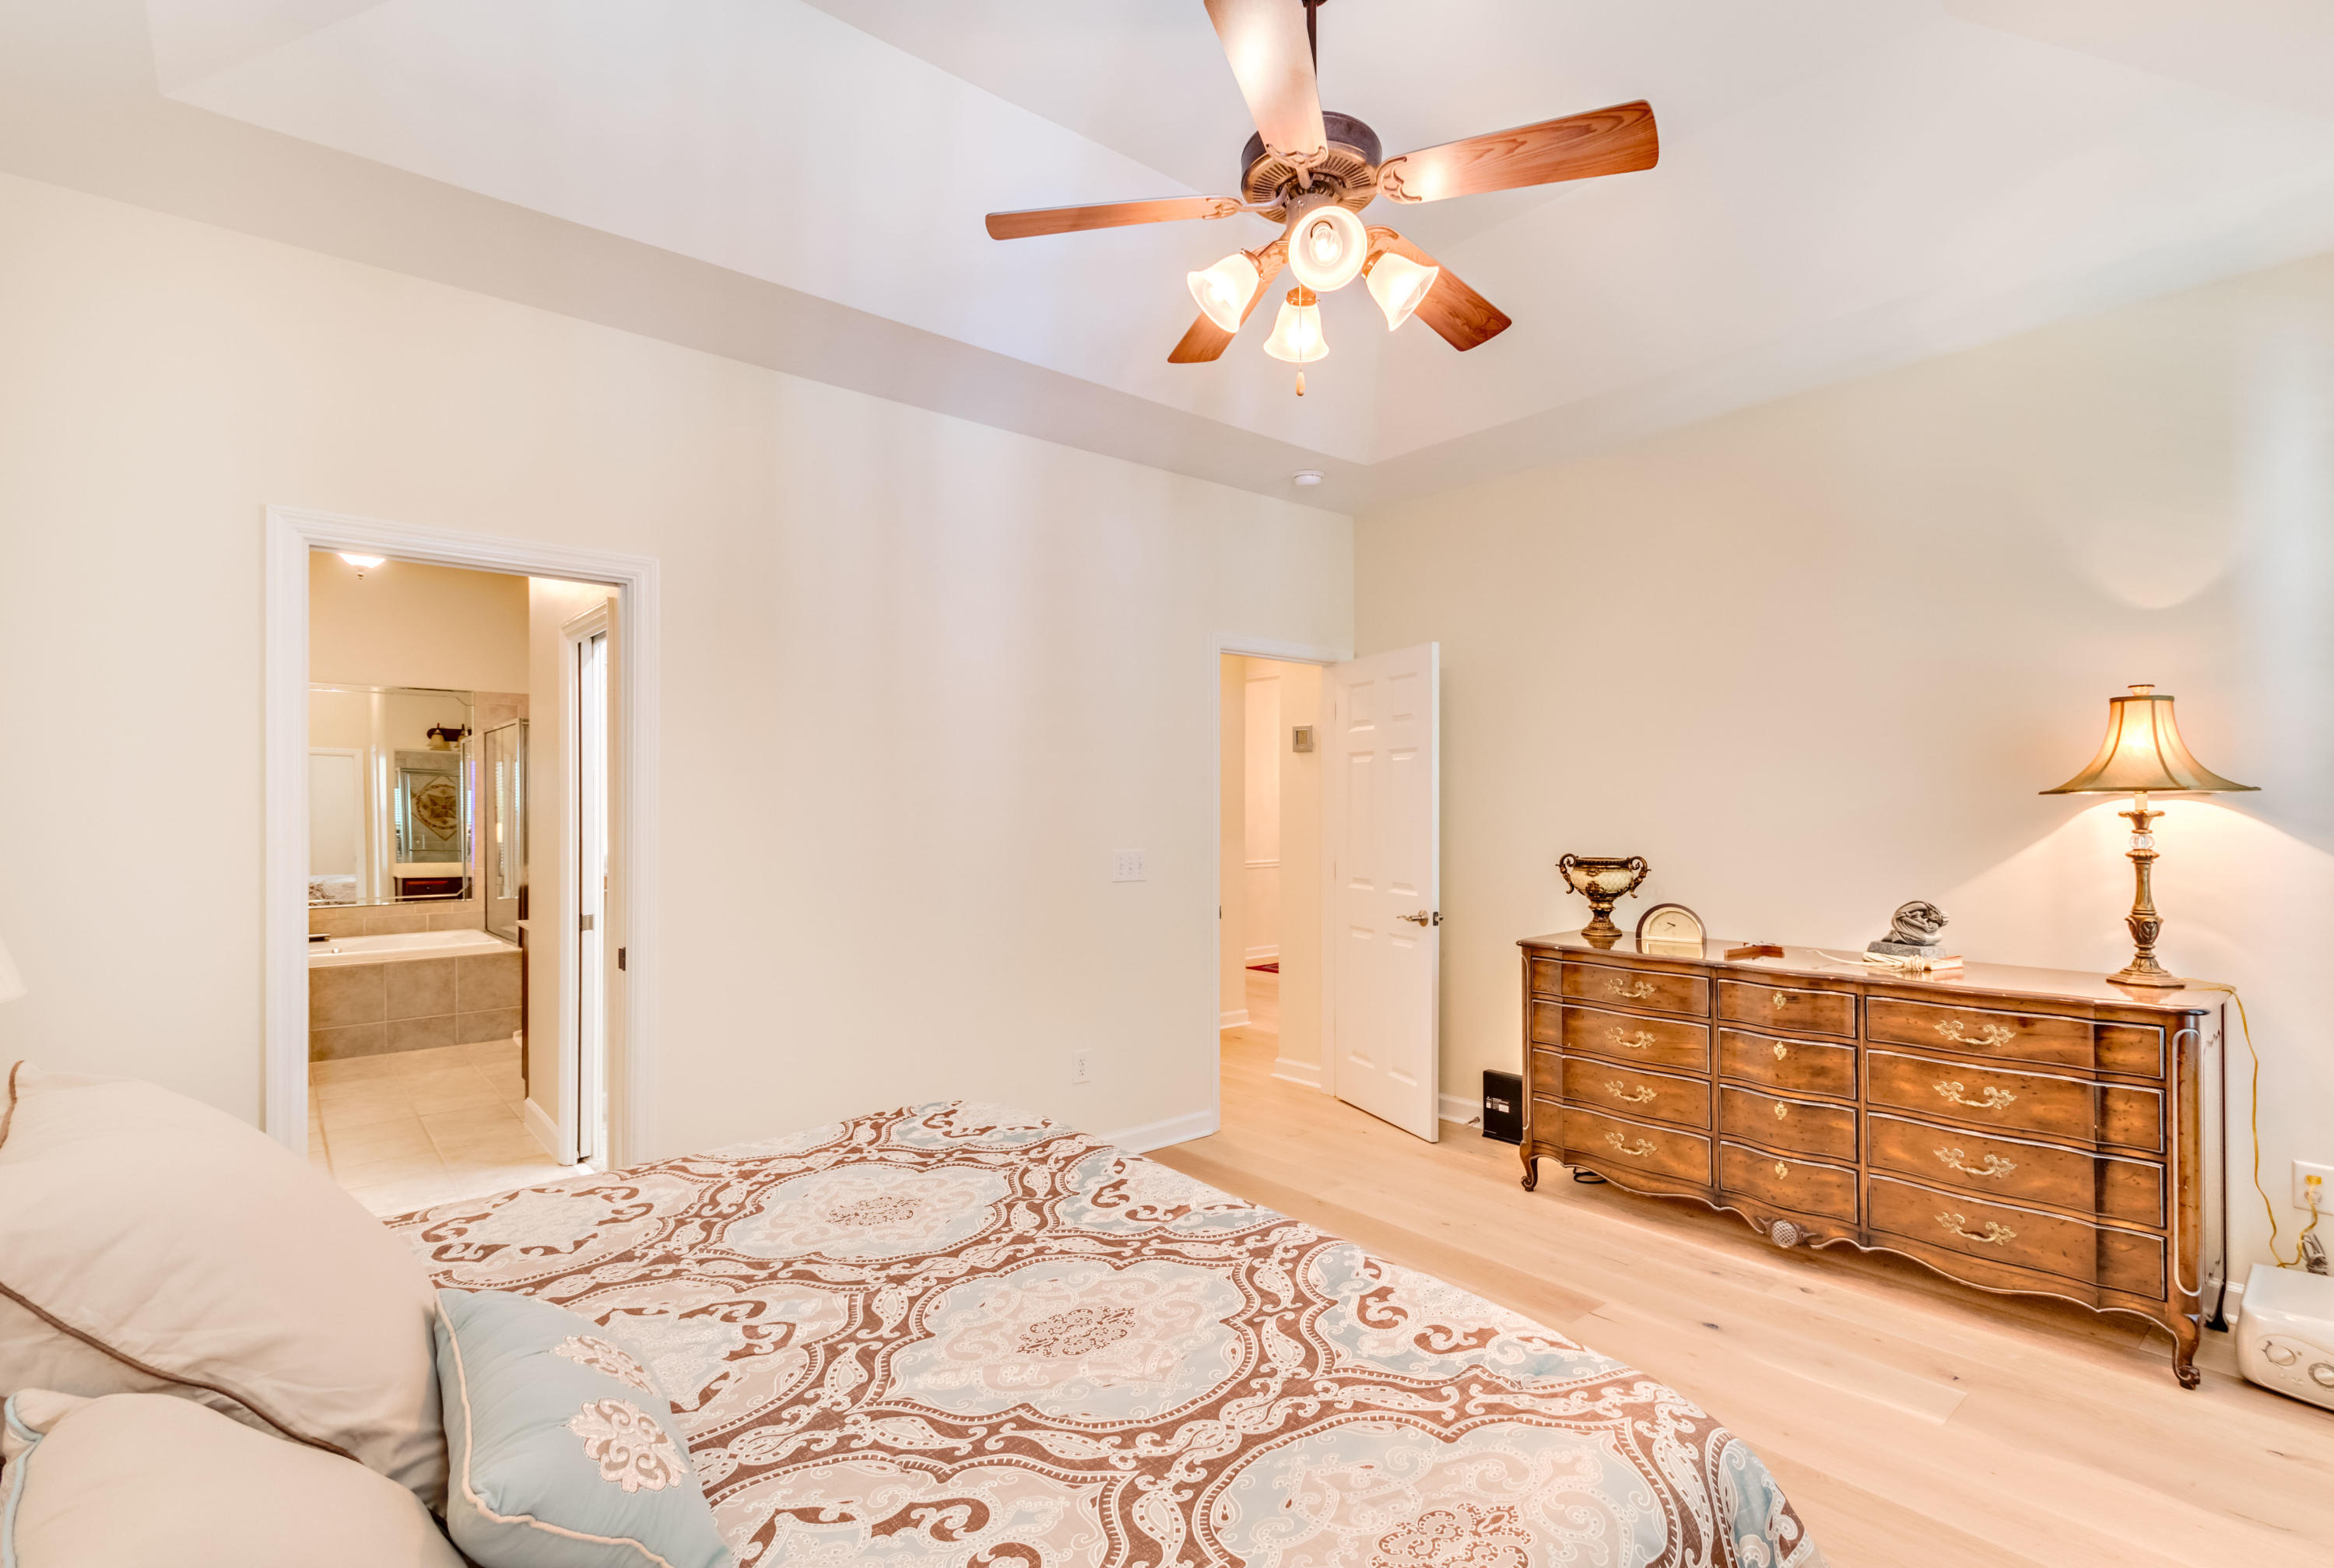 Dunes West Homes For Sale - 101 Fresh Meadow, Mount Pleasant, SC - 10